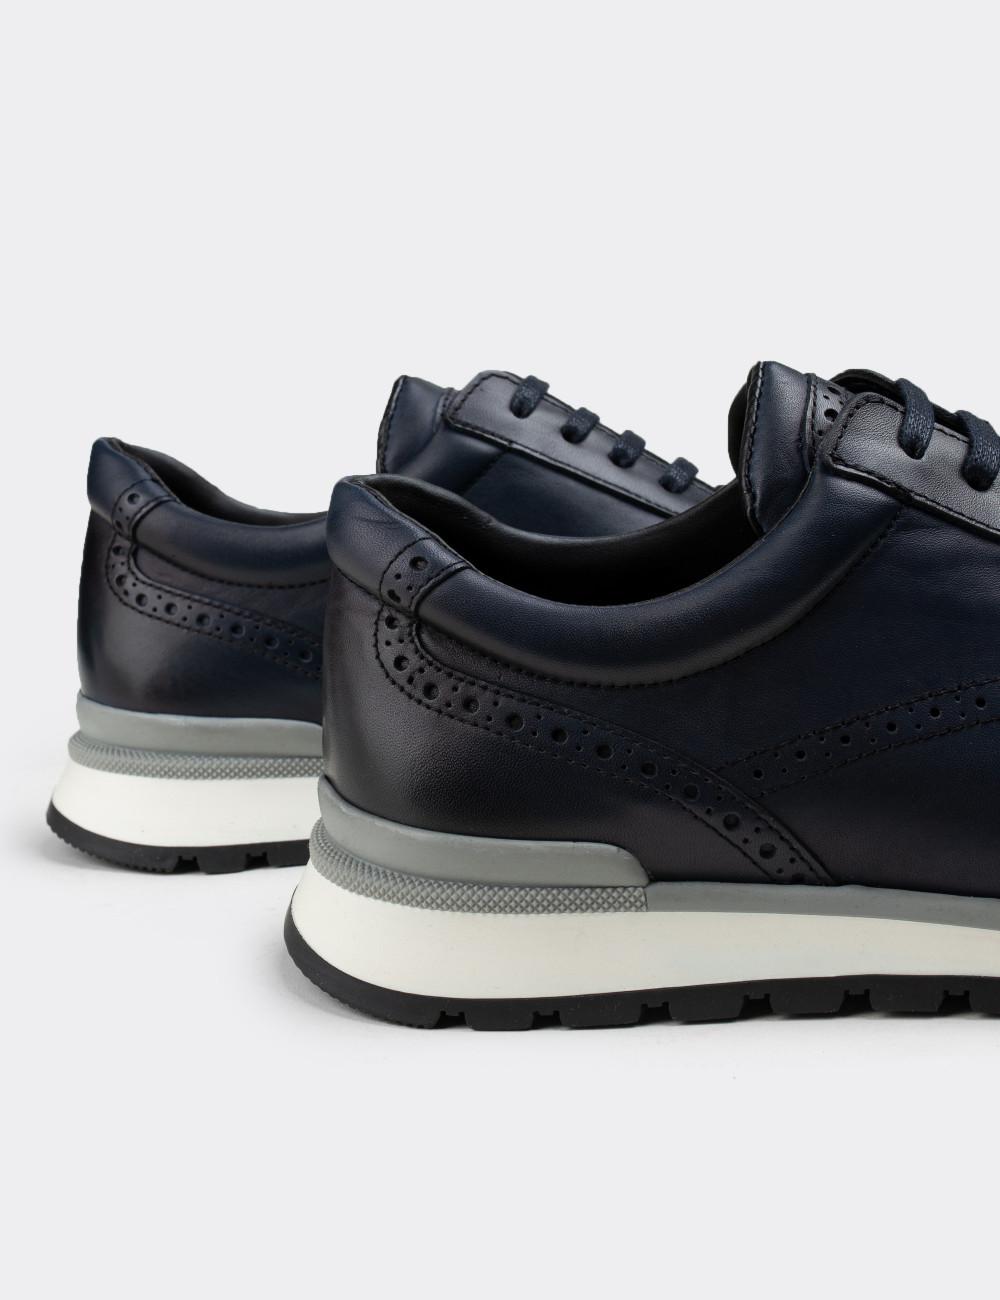 Hakiki Deri Lacivert Erkek Sneaker - 00750MLCVT02